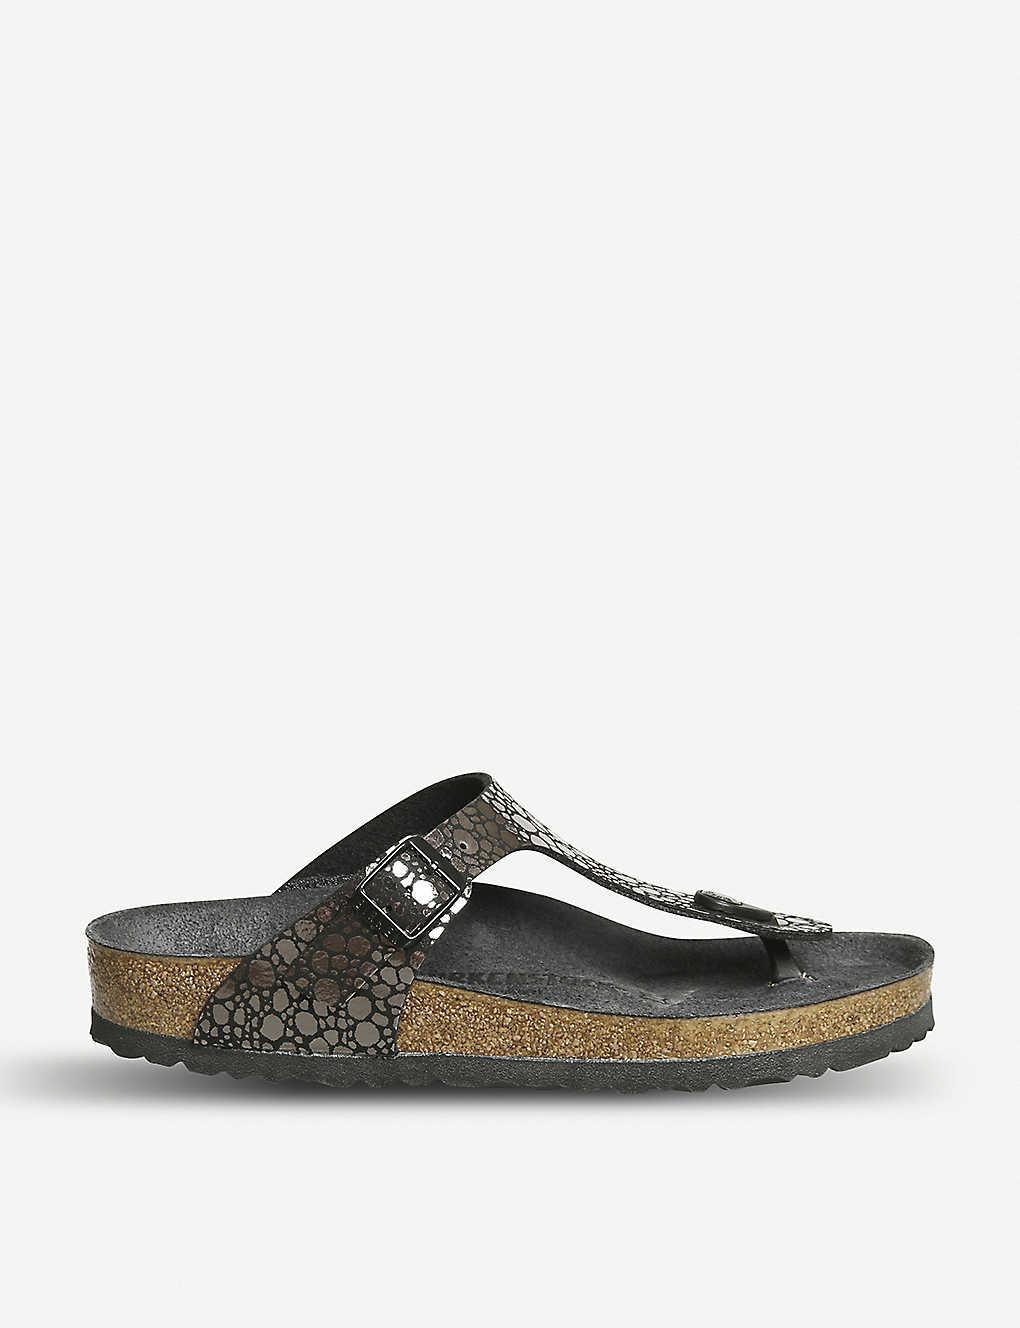 a59e020bb8c4cf BIRKENSTOCK - Gizeh metallic sandals